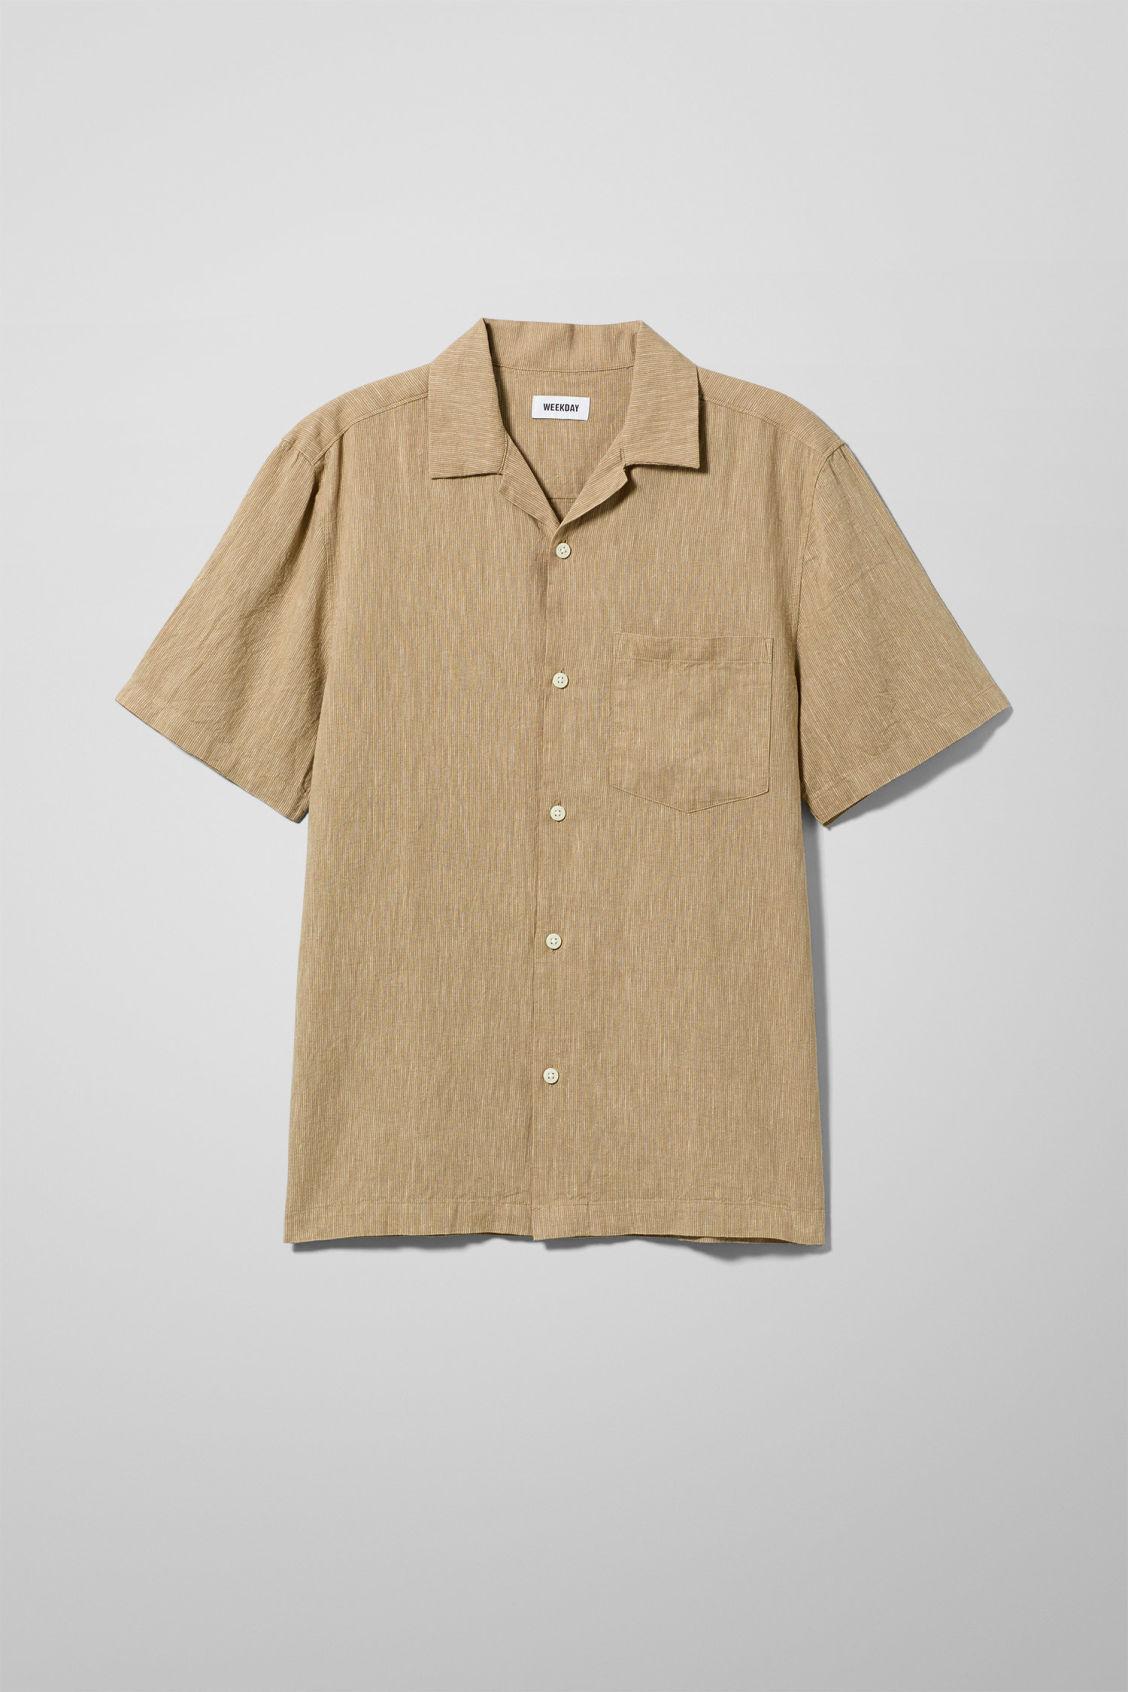 Chill Striped Short Sleeve Shirt - Beige